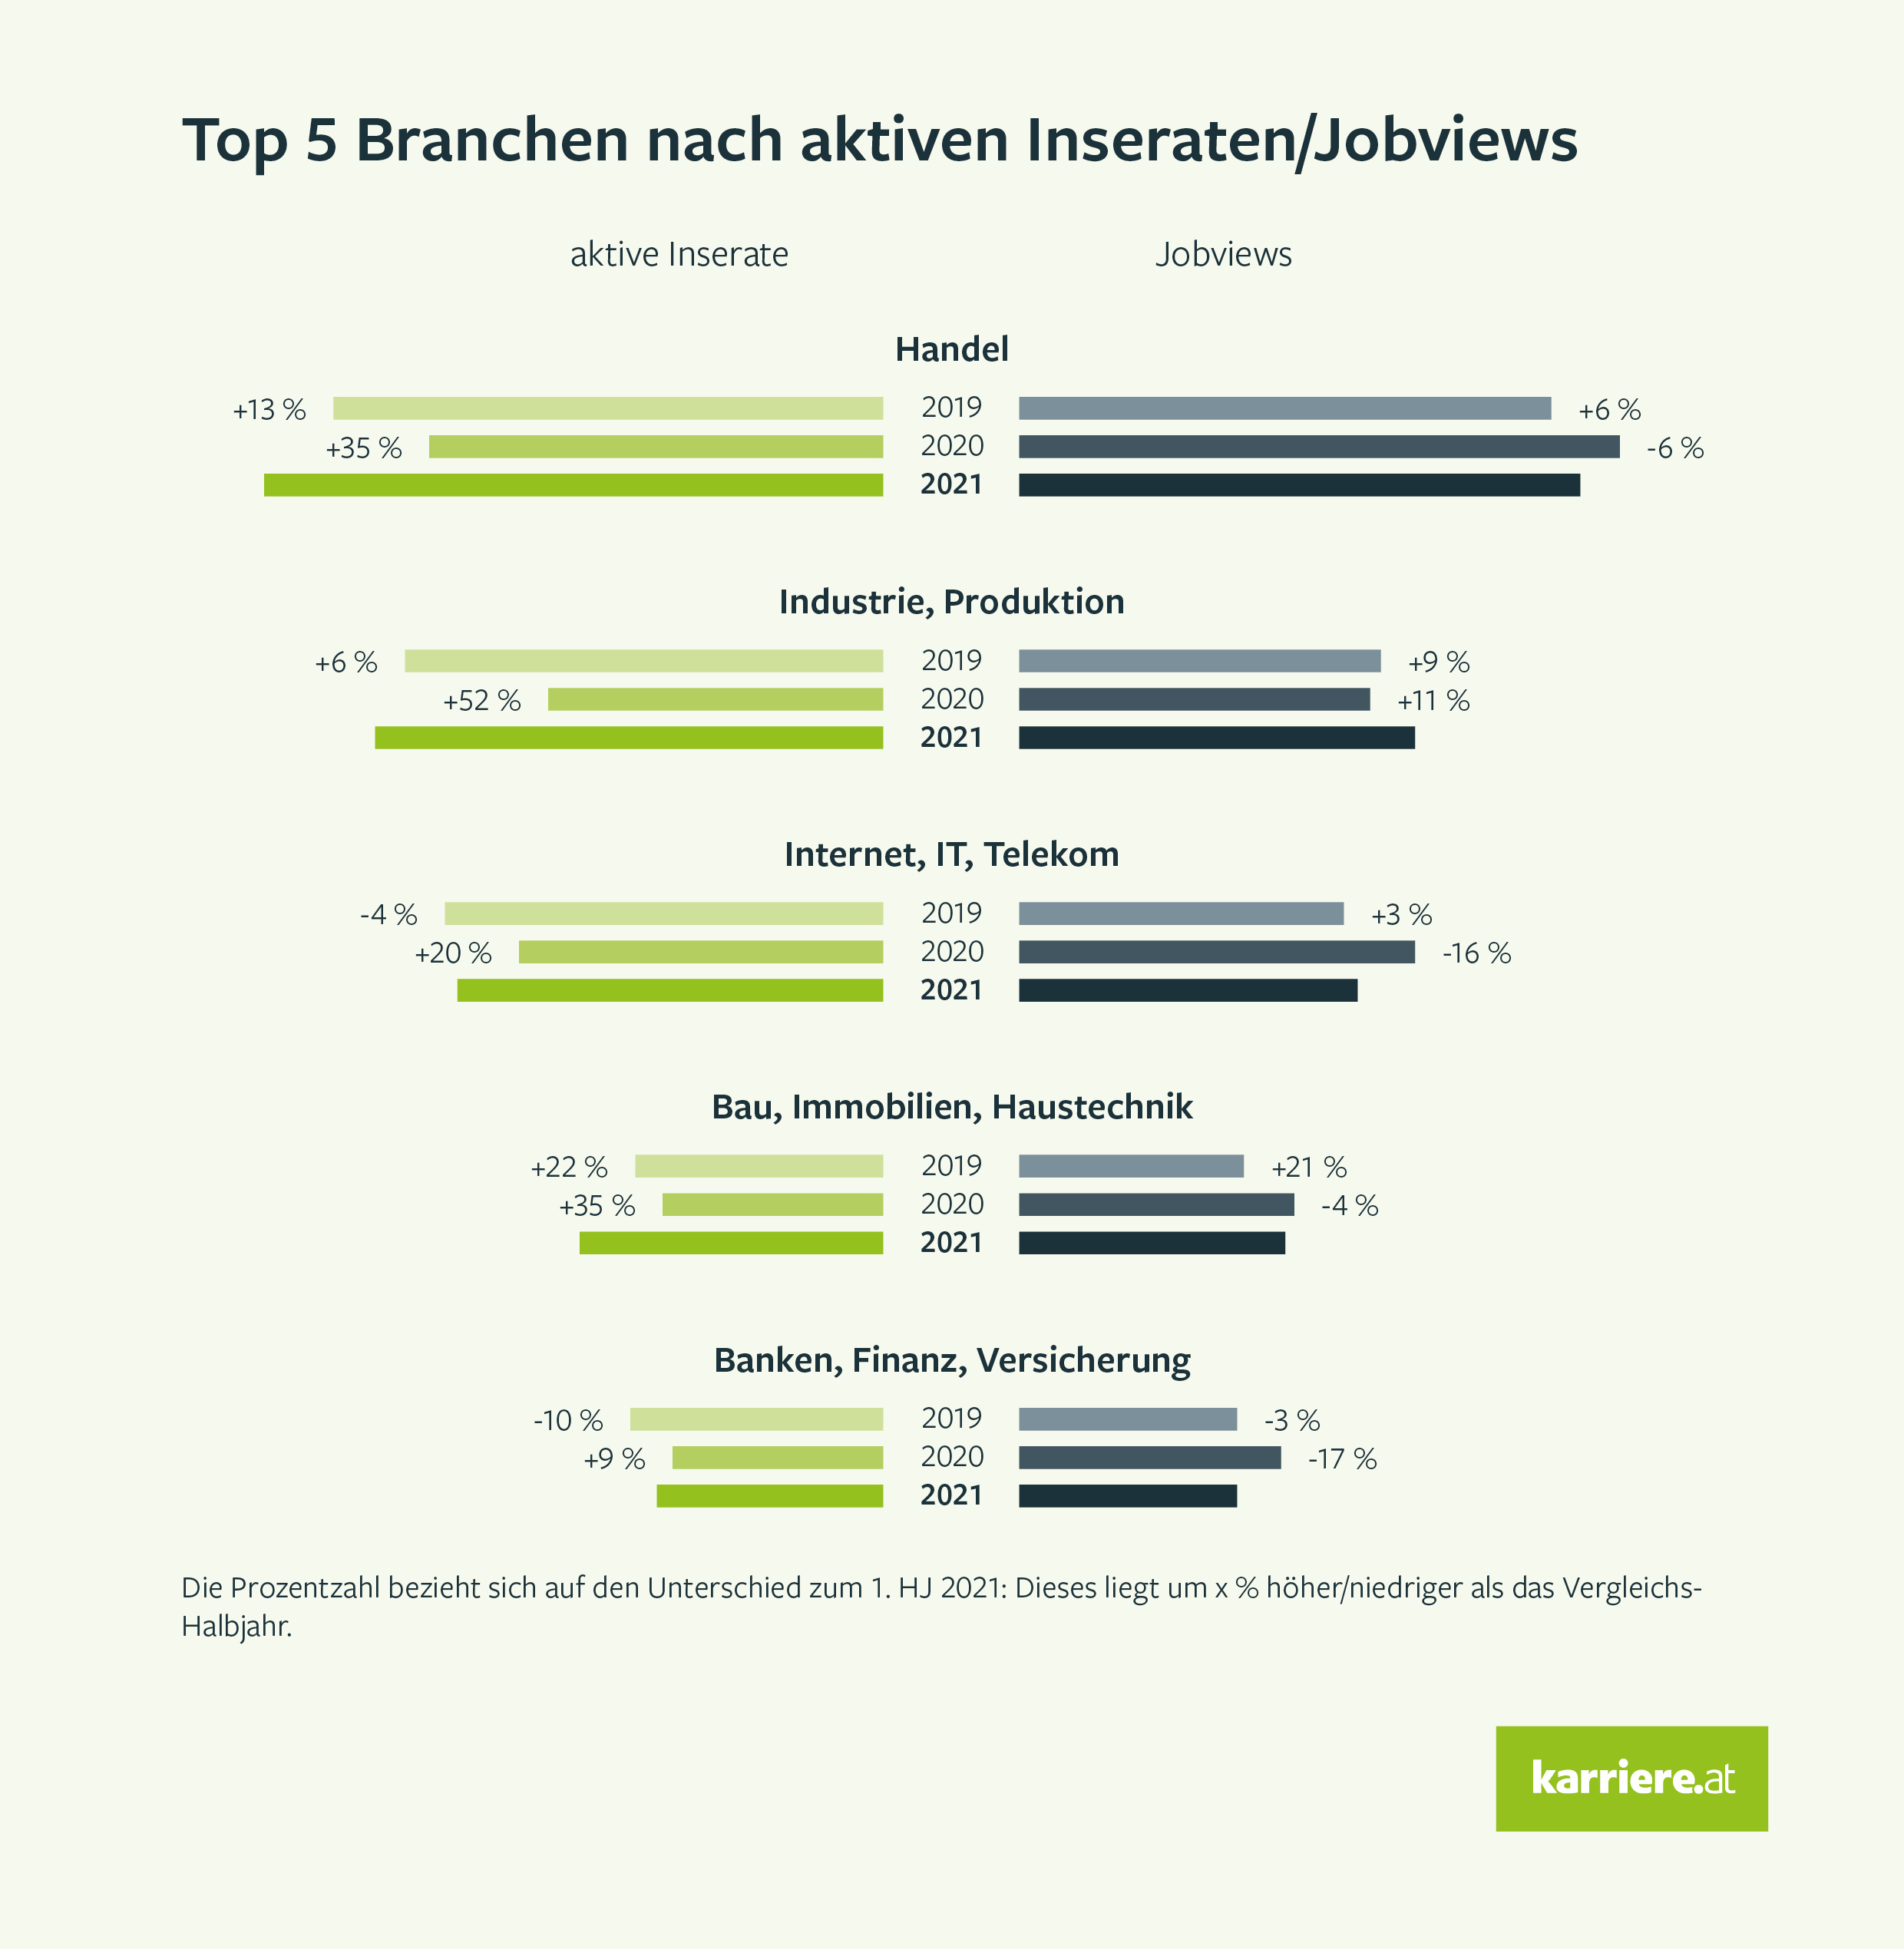 Top-5-Branchen nach aktiven Inseraten/Jobviews